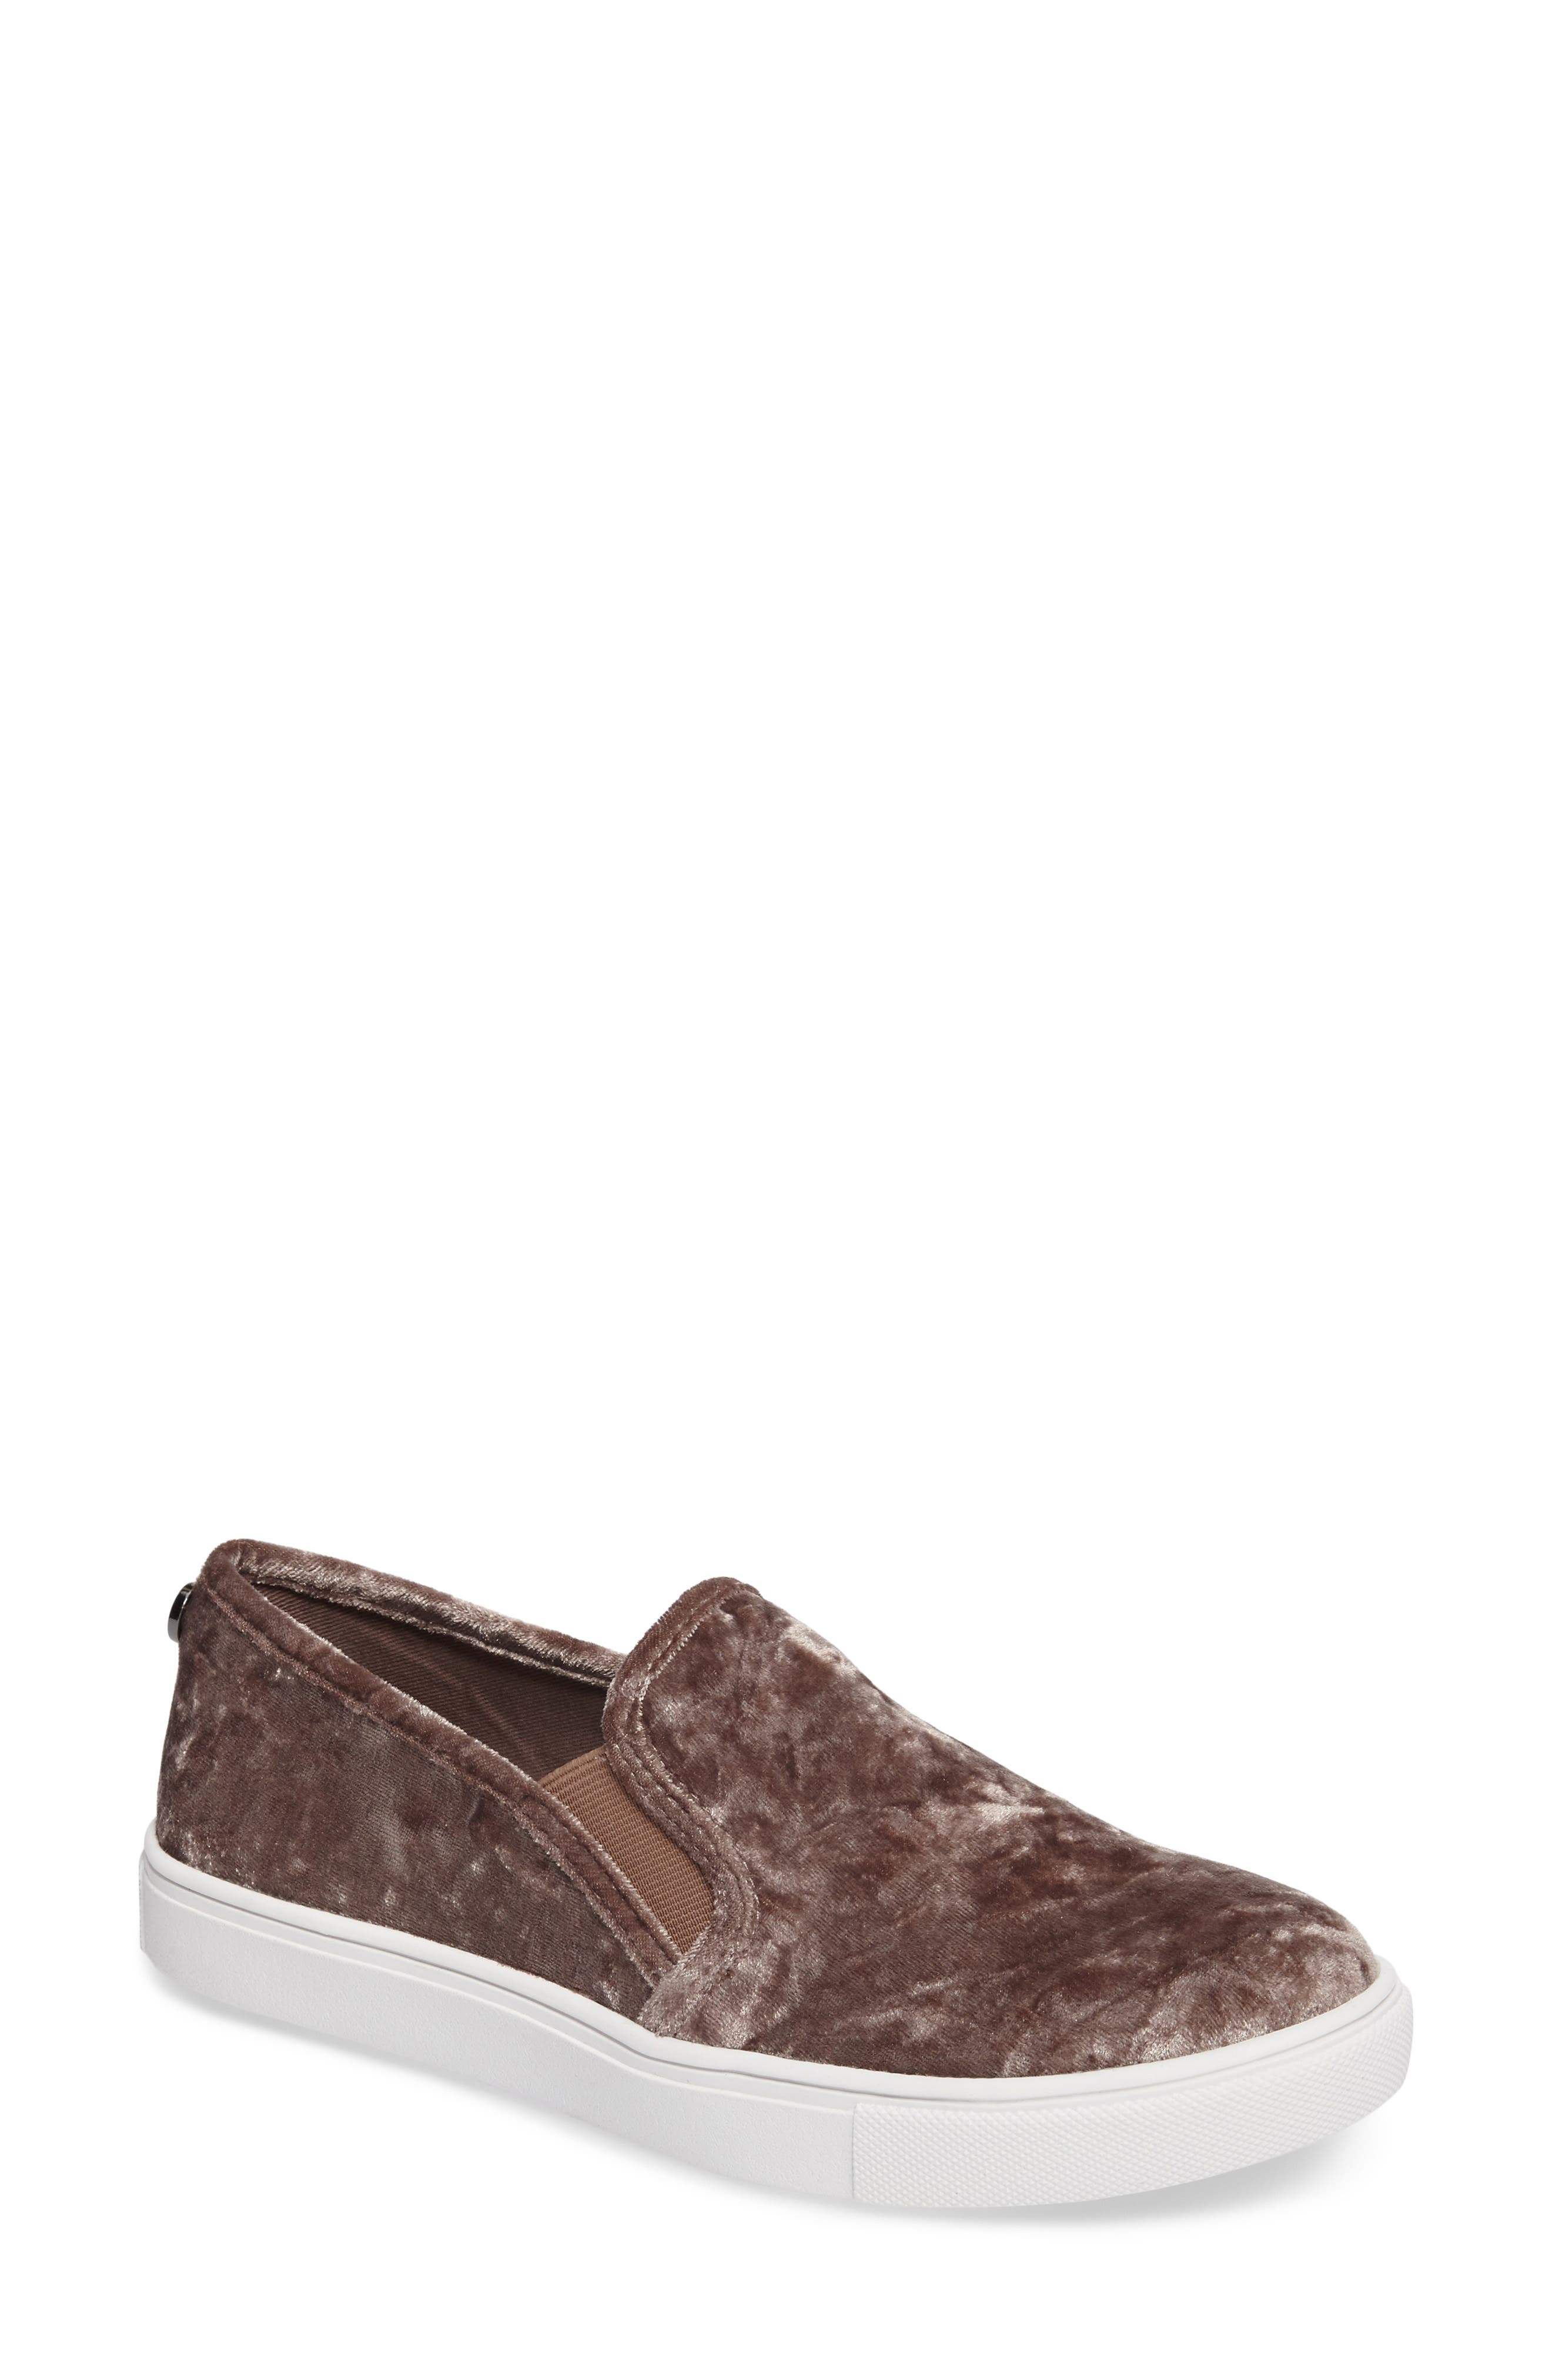 Ecntrcv Slip-On Sneaker,                         Main,                         color, Mushroom Fabric